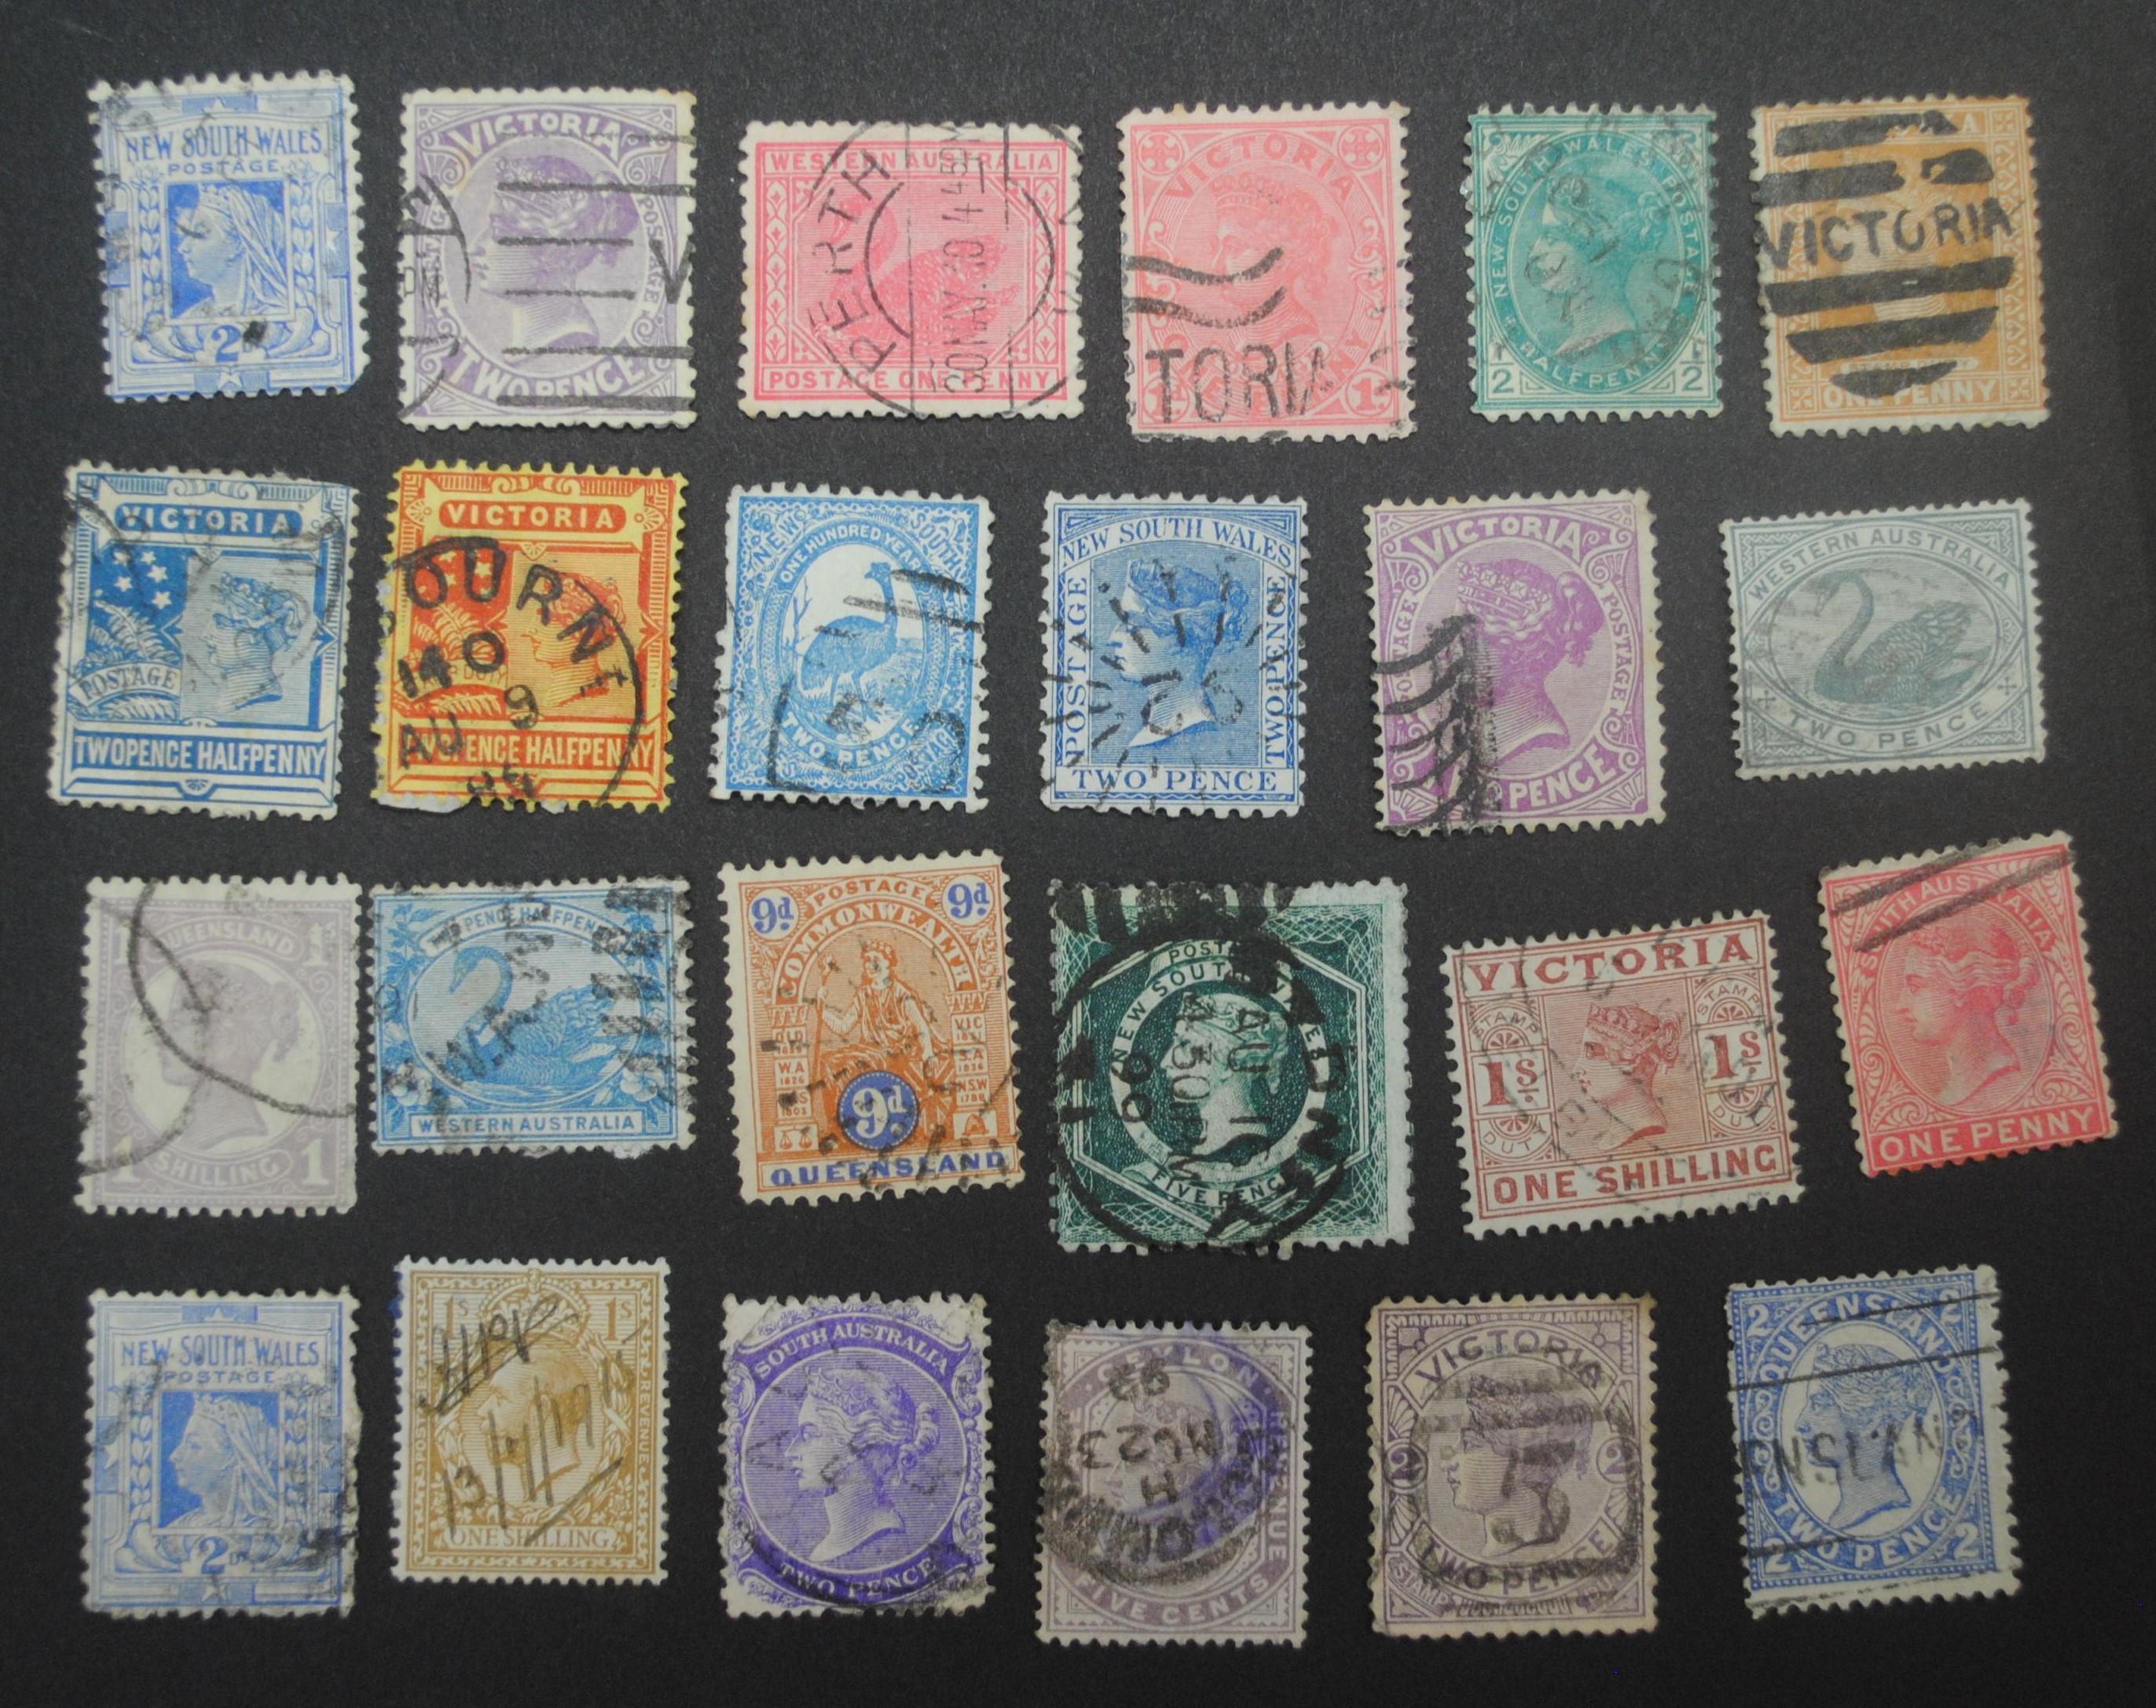 Australia States Stamp Collection 1